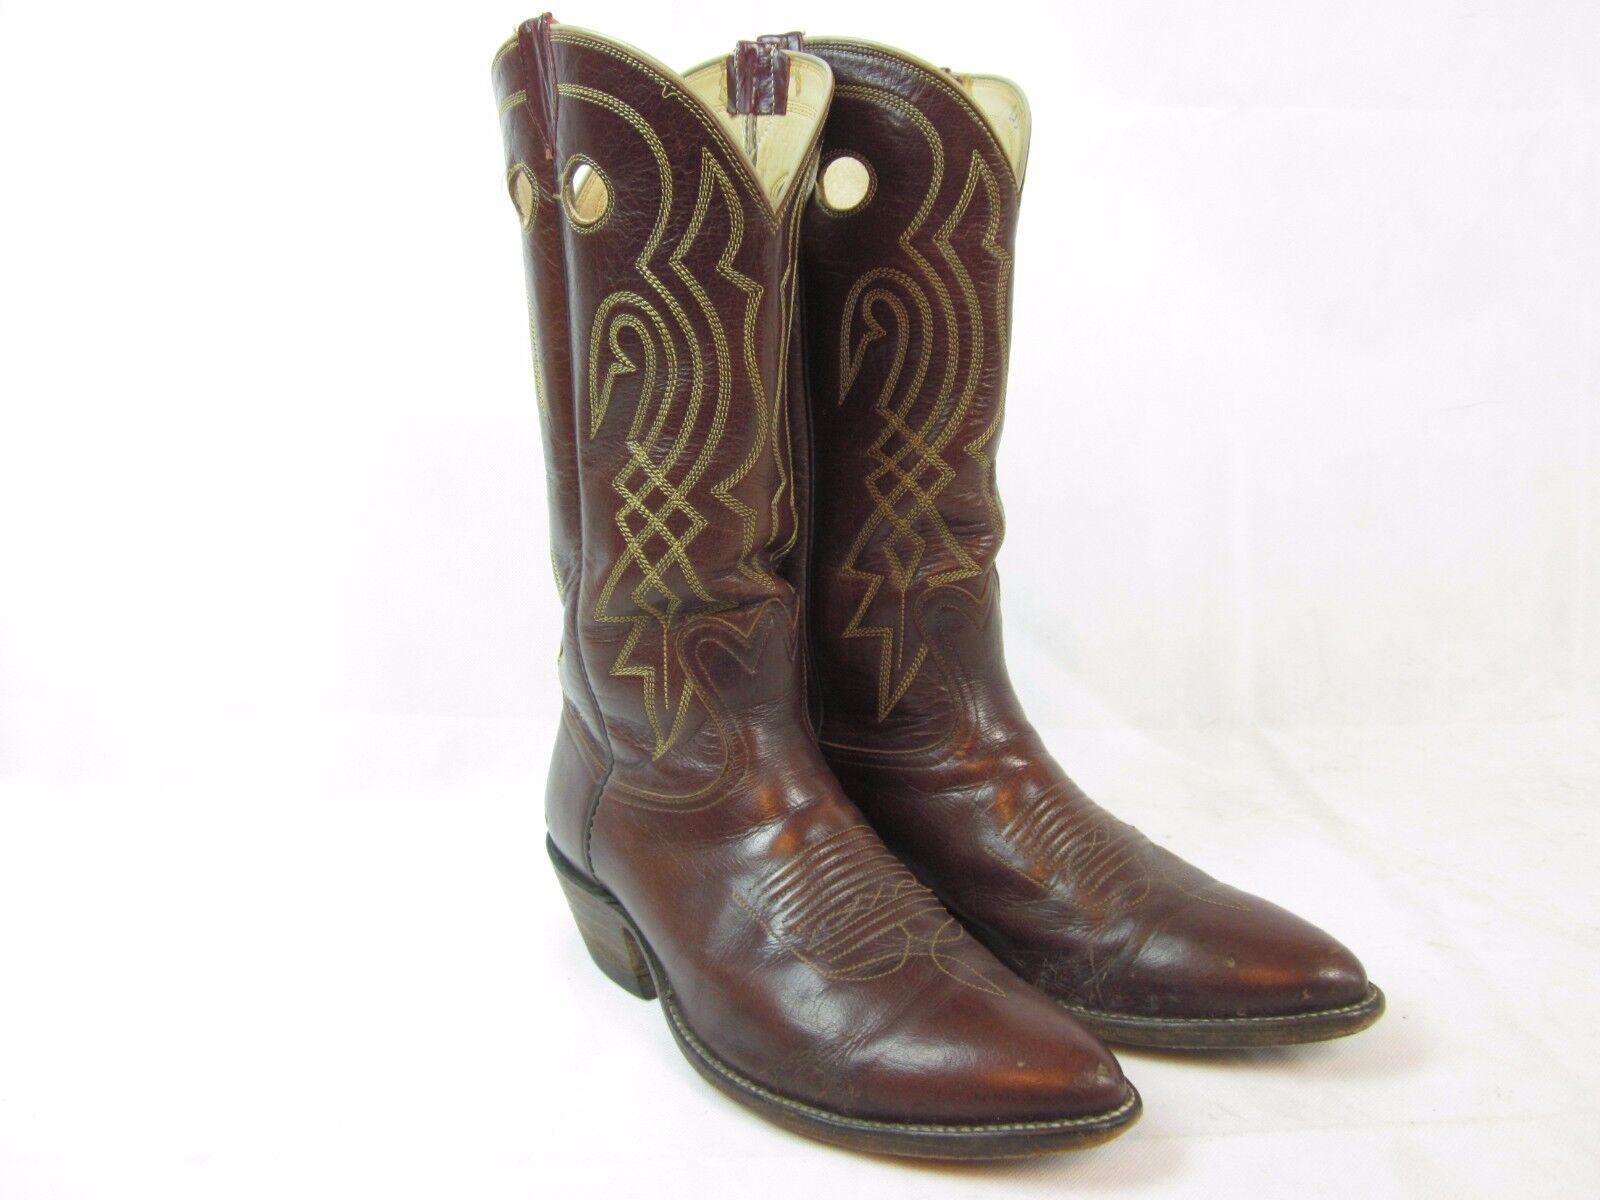 BOWhomme Wilson démarrage Company Marron Western Cowboy bottes Homme 10.5